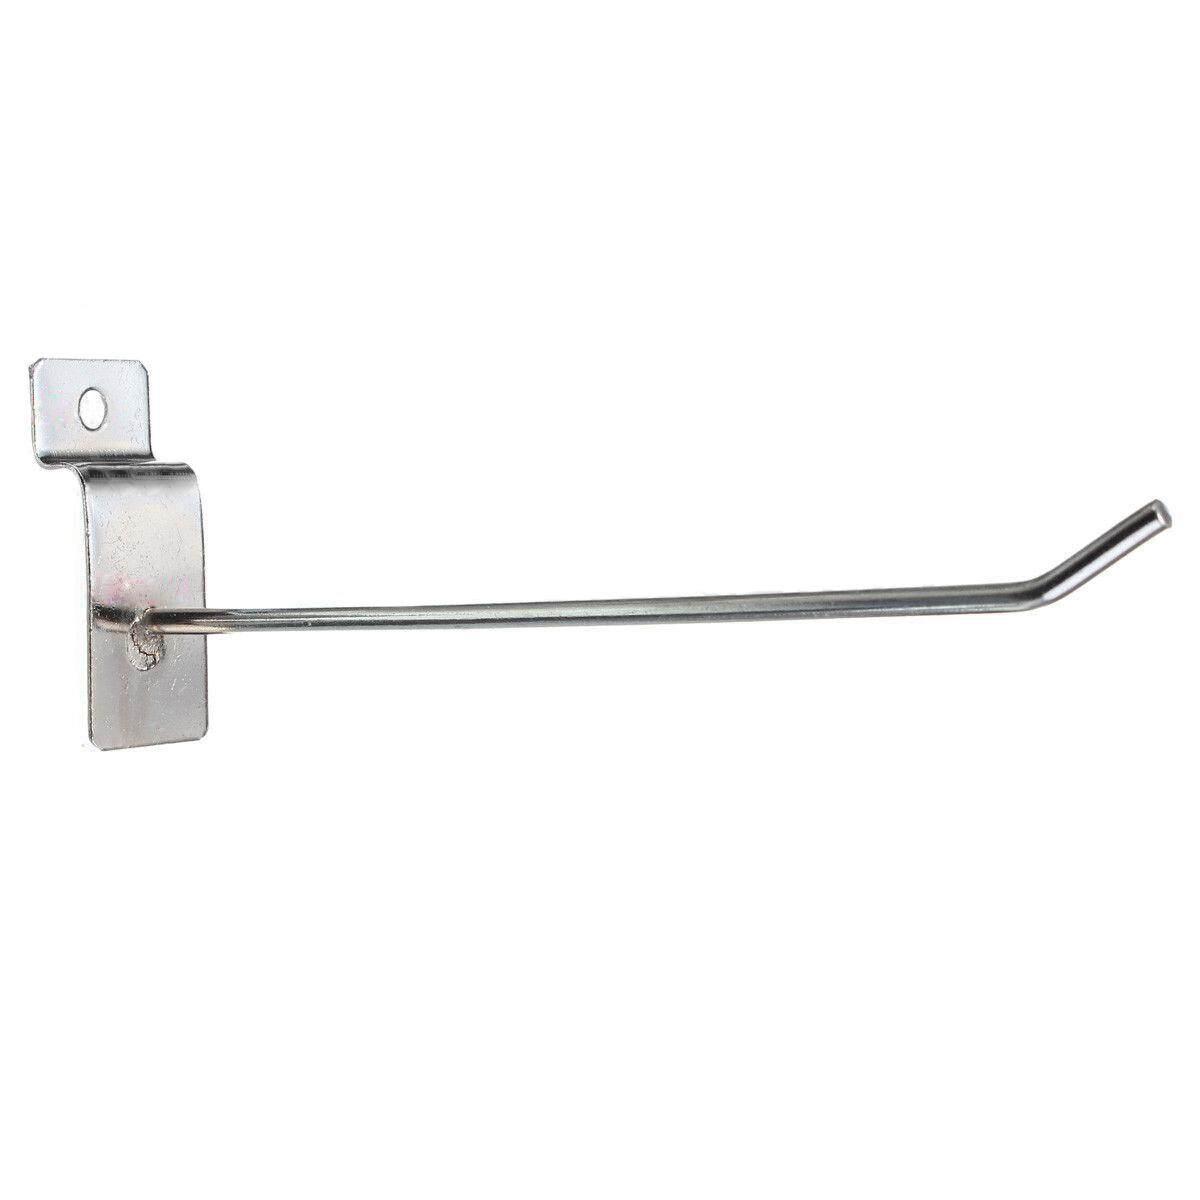 25 x Slatwall Single Hook Pin Shop Display Fitting Prong Hanger 150mm